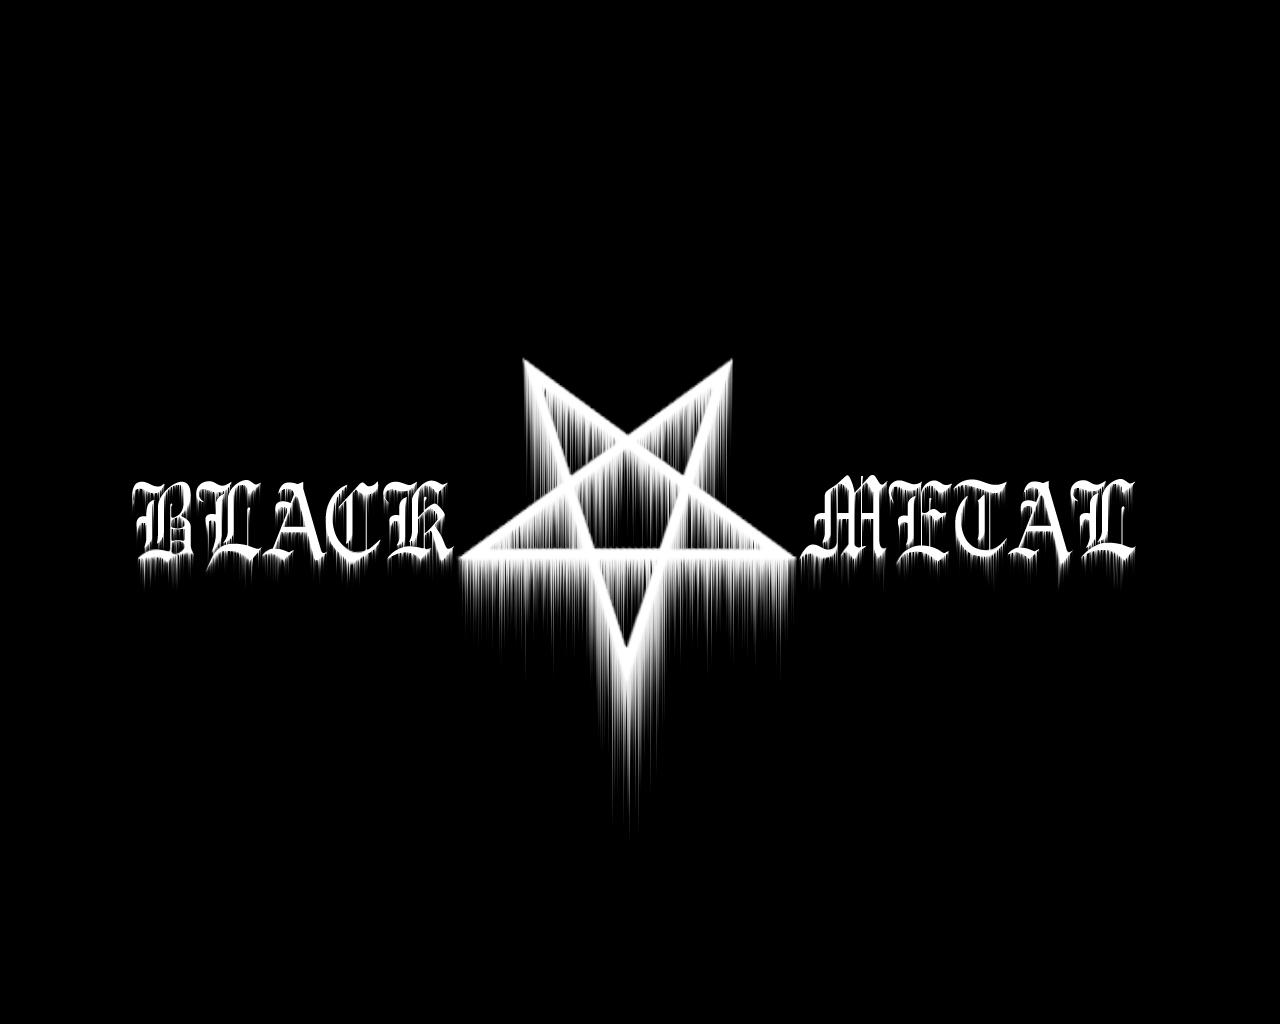 Black Metal By Mefistoteles On Deviantart